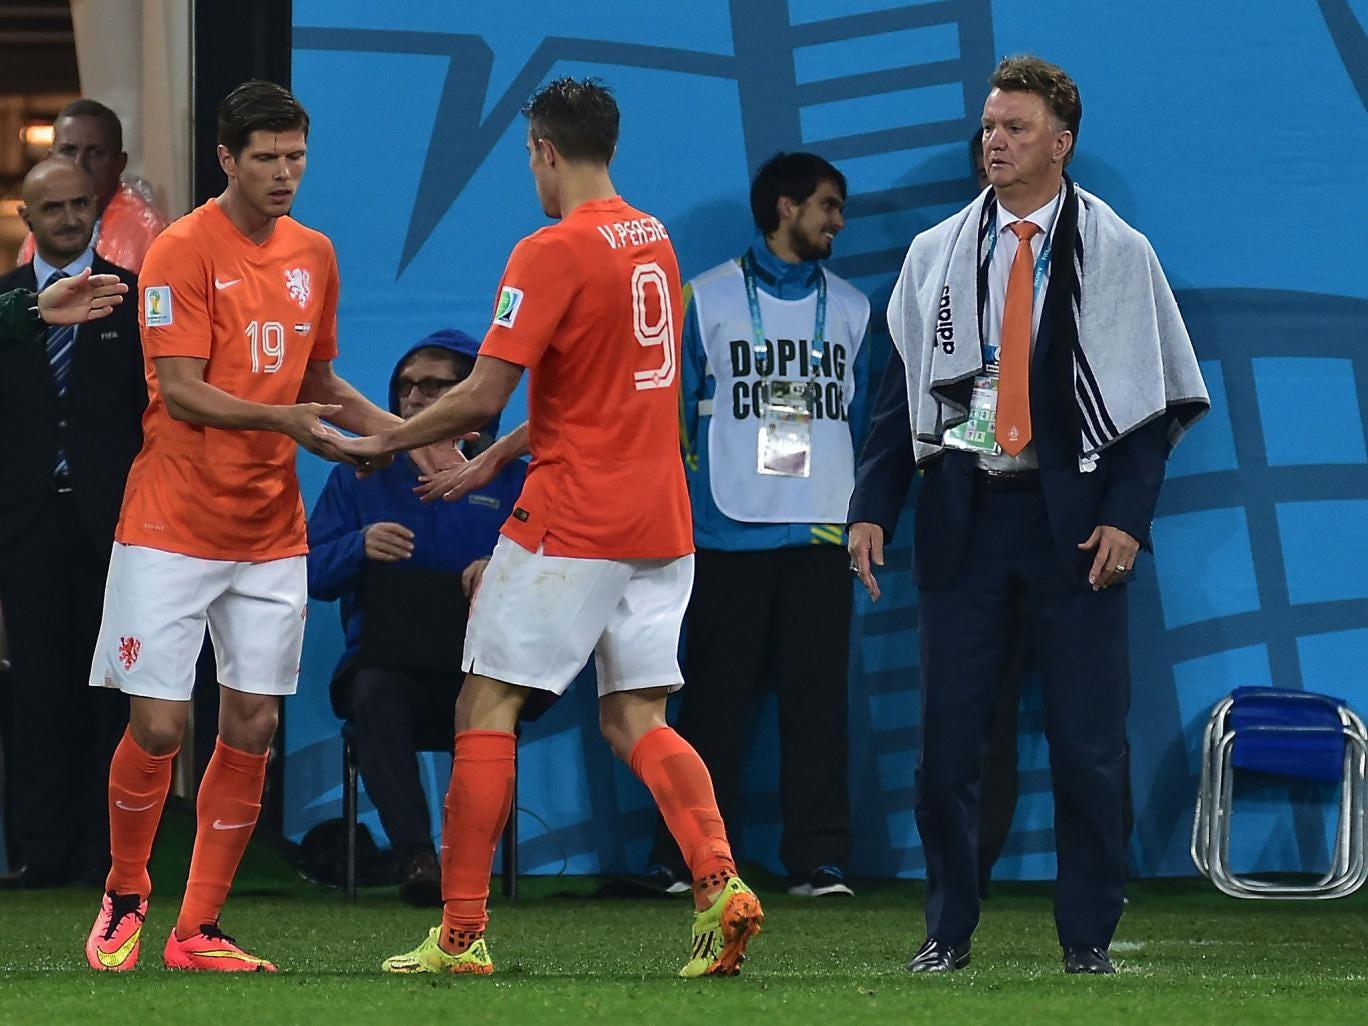 Netherlands' coach Louis van Gaal (R) looks on as Netherlands' forward and captain Robin van Persie (C) shakes hands with Netherlands' forward Klaas-Jan Huntelaar